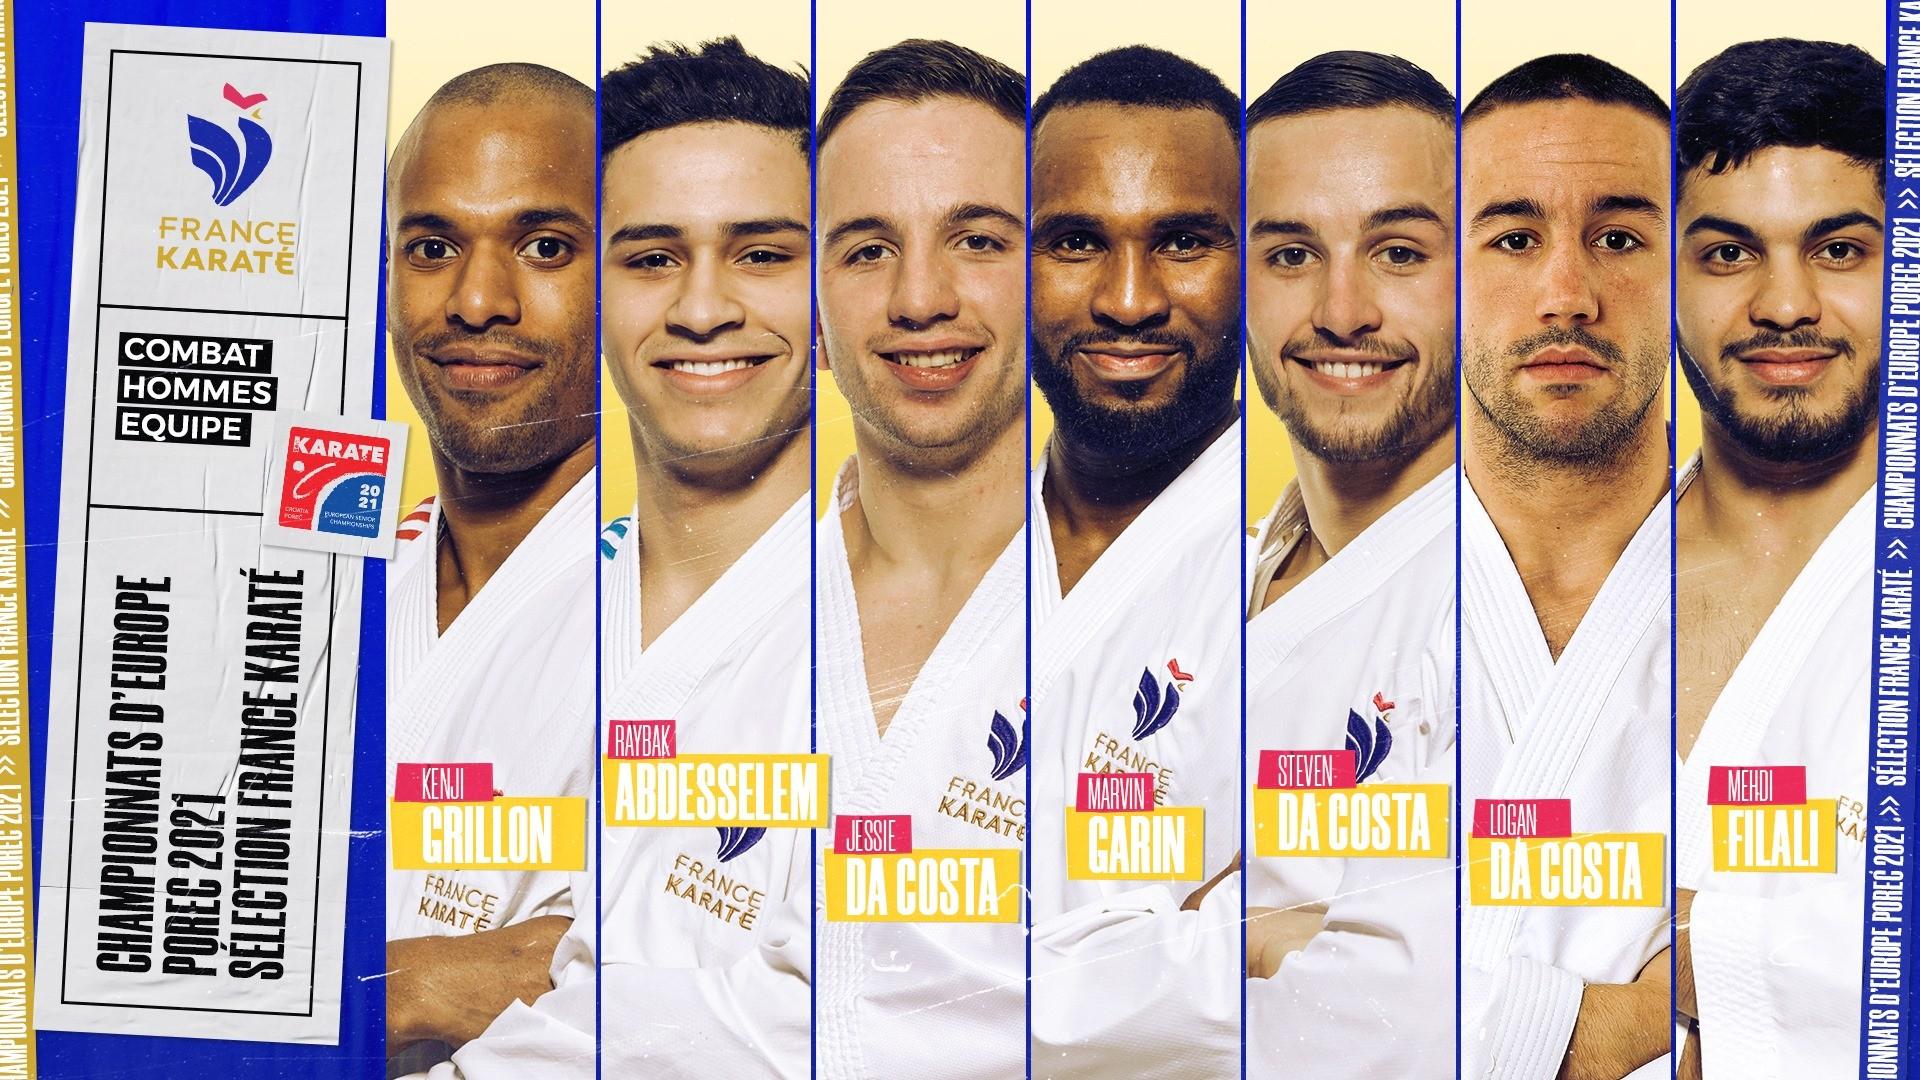 Equipe de France Combat